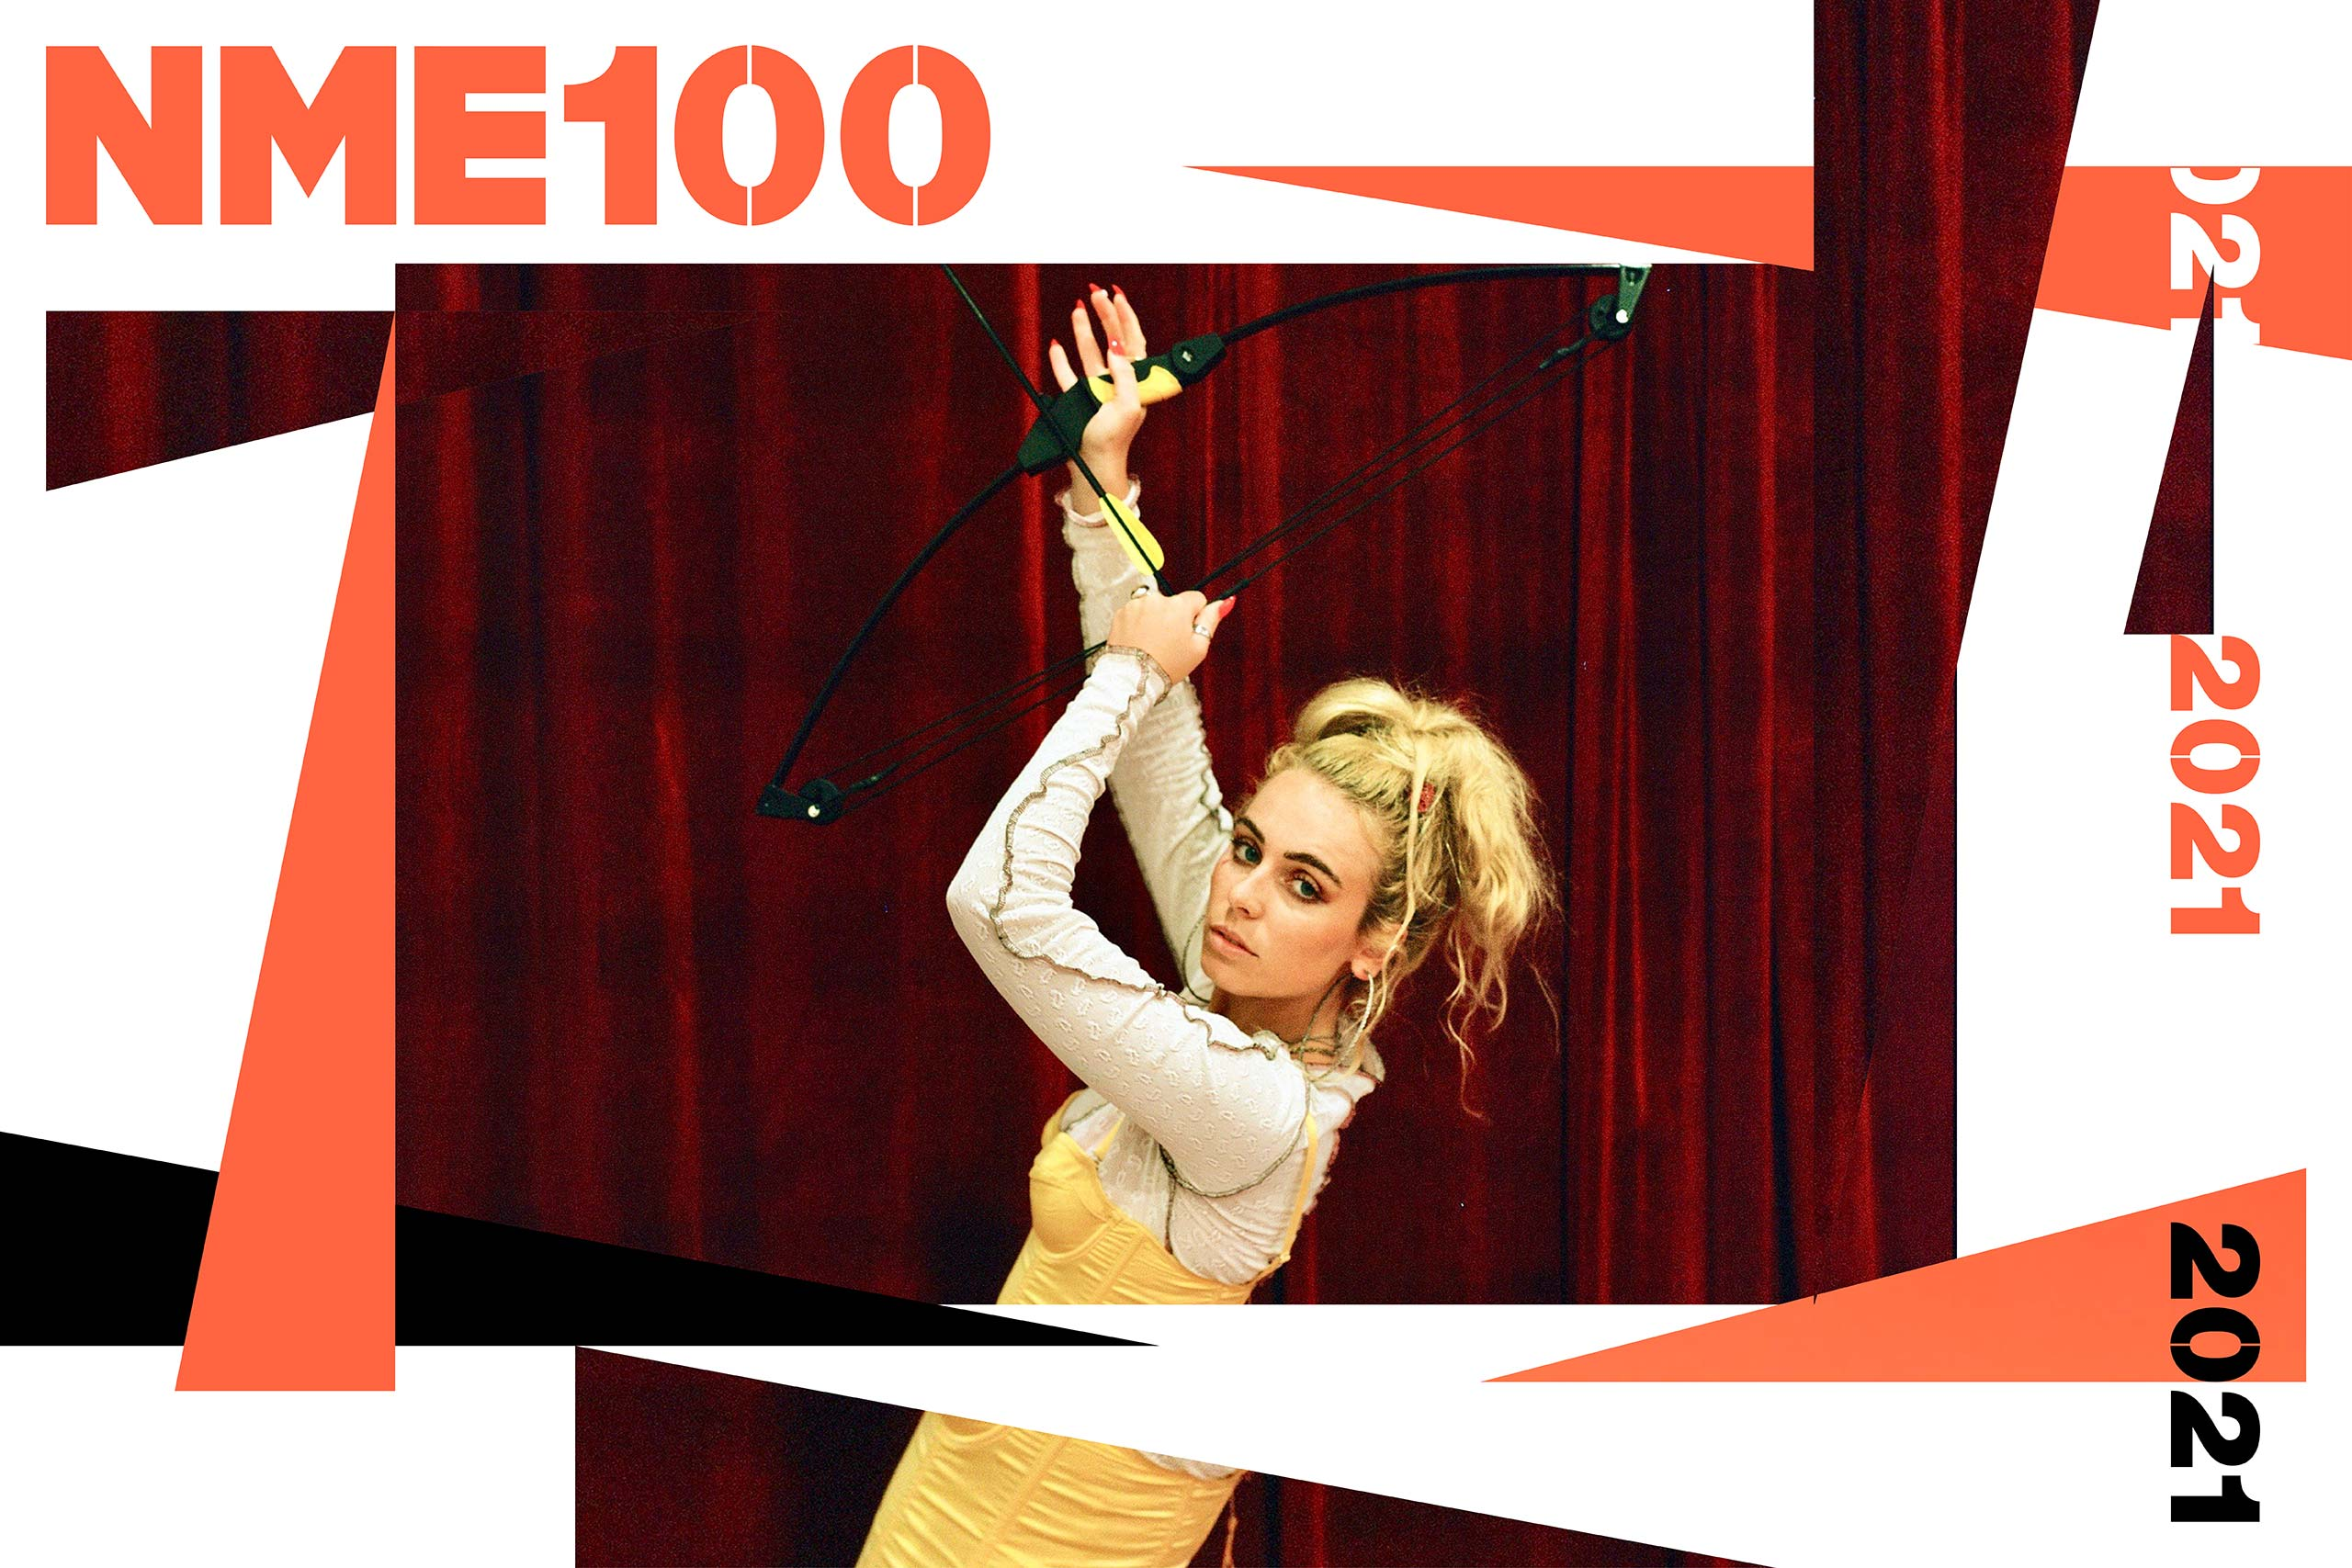 NME 100 rose gray